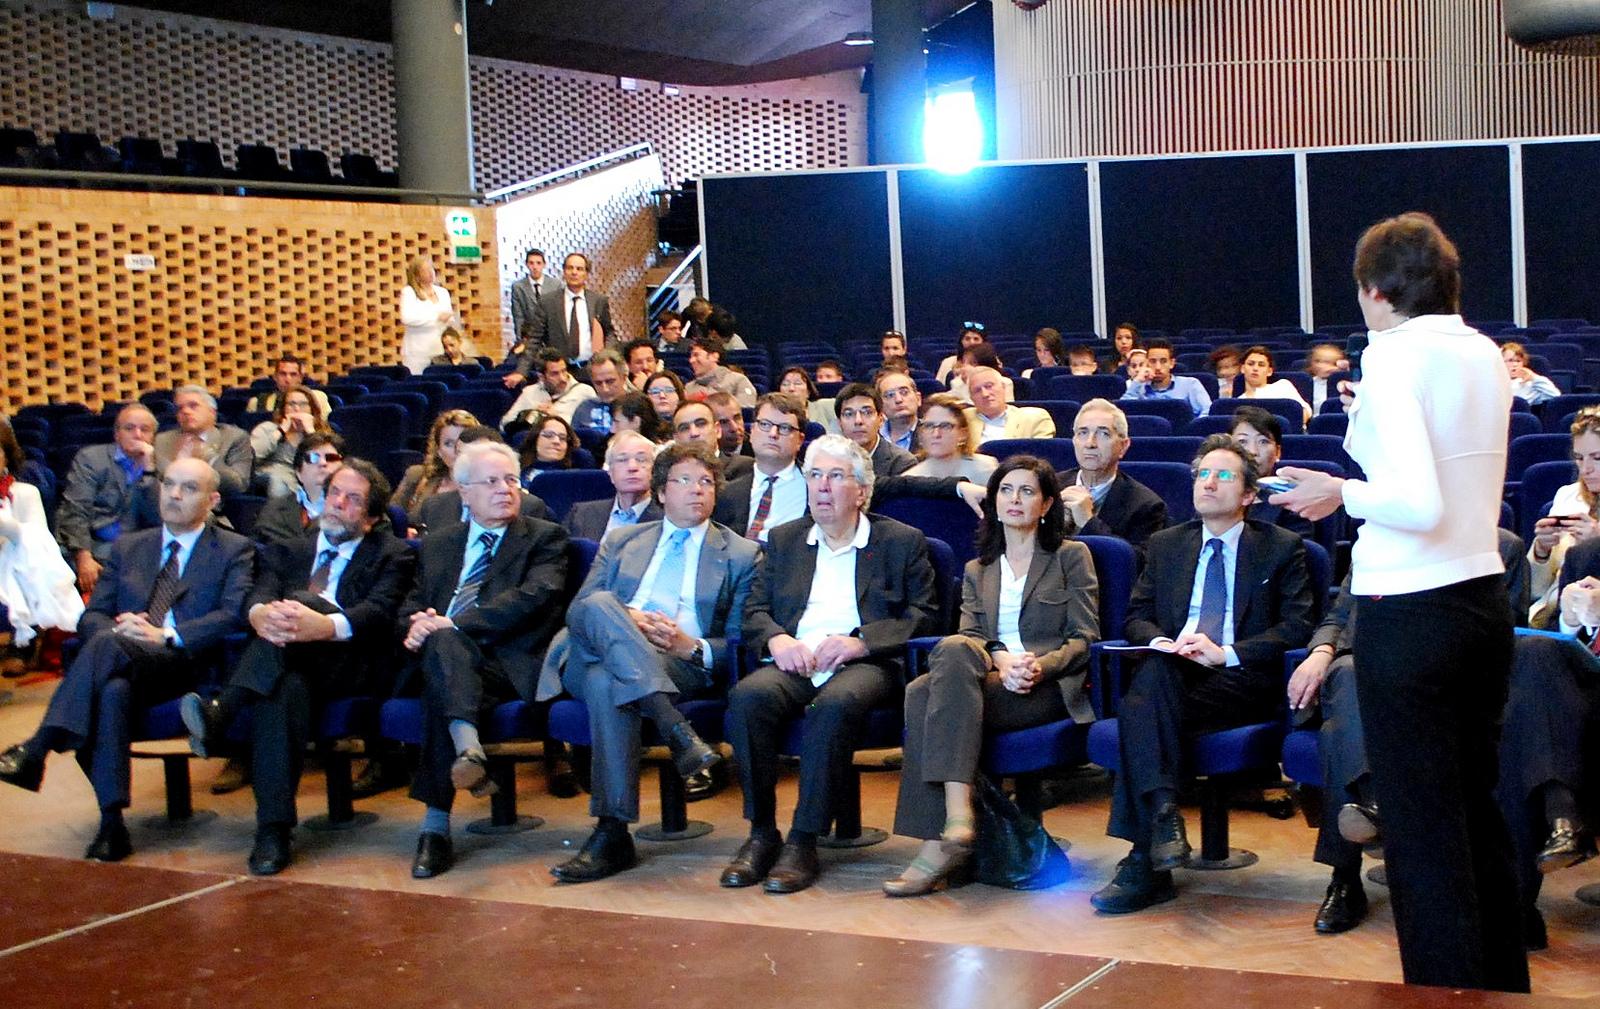 Silvestrini Presidente Camera Laura Boldrini